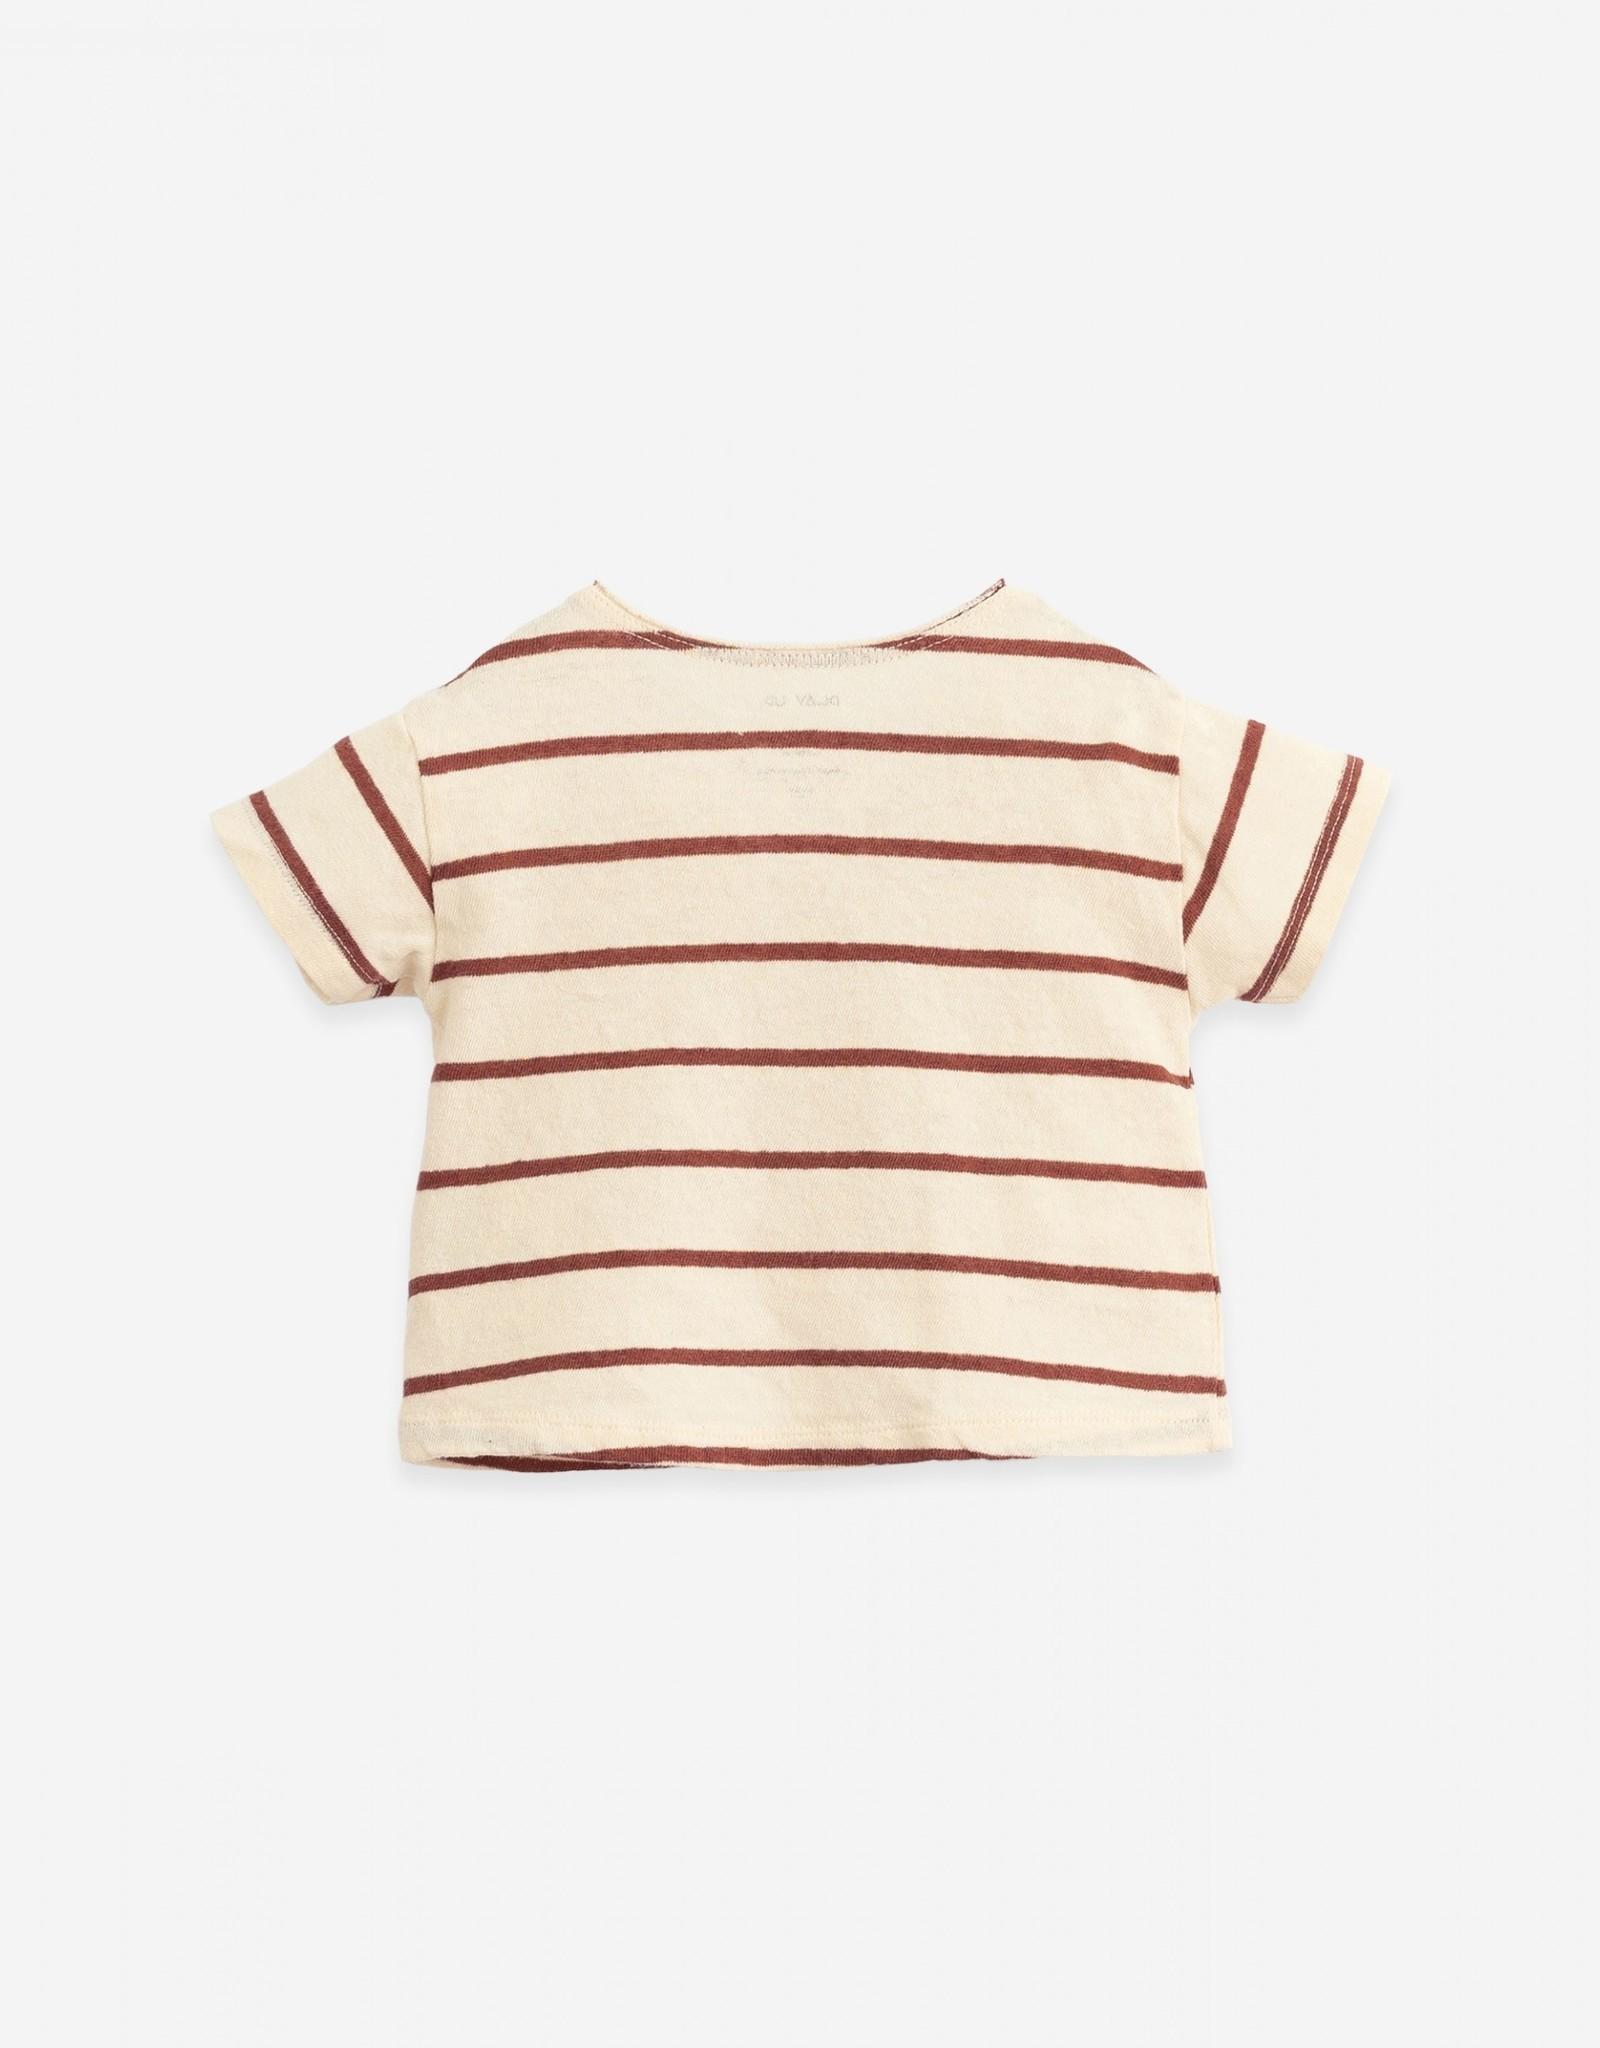 Play Up Play Up gestreept t-shirt met knoopjes farm (roest/ecru)